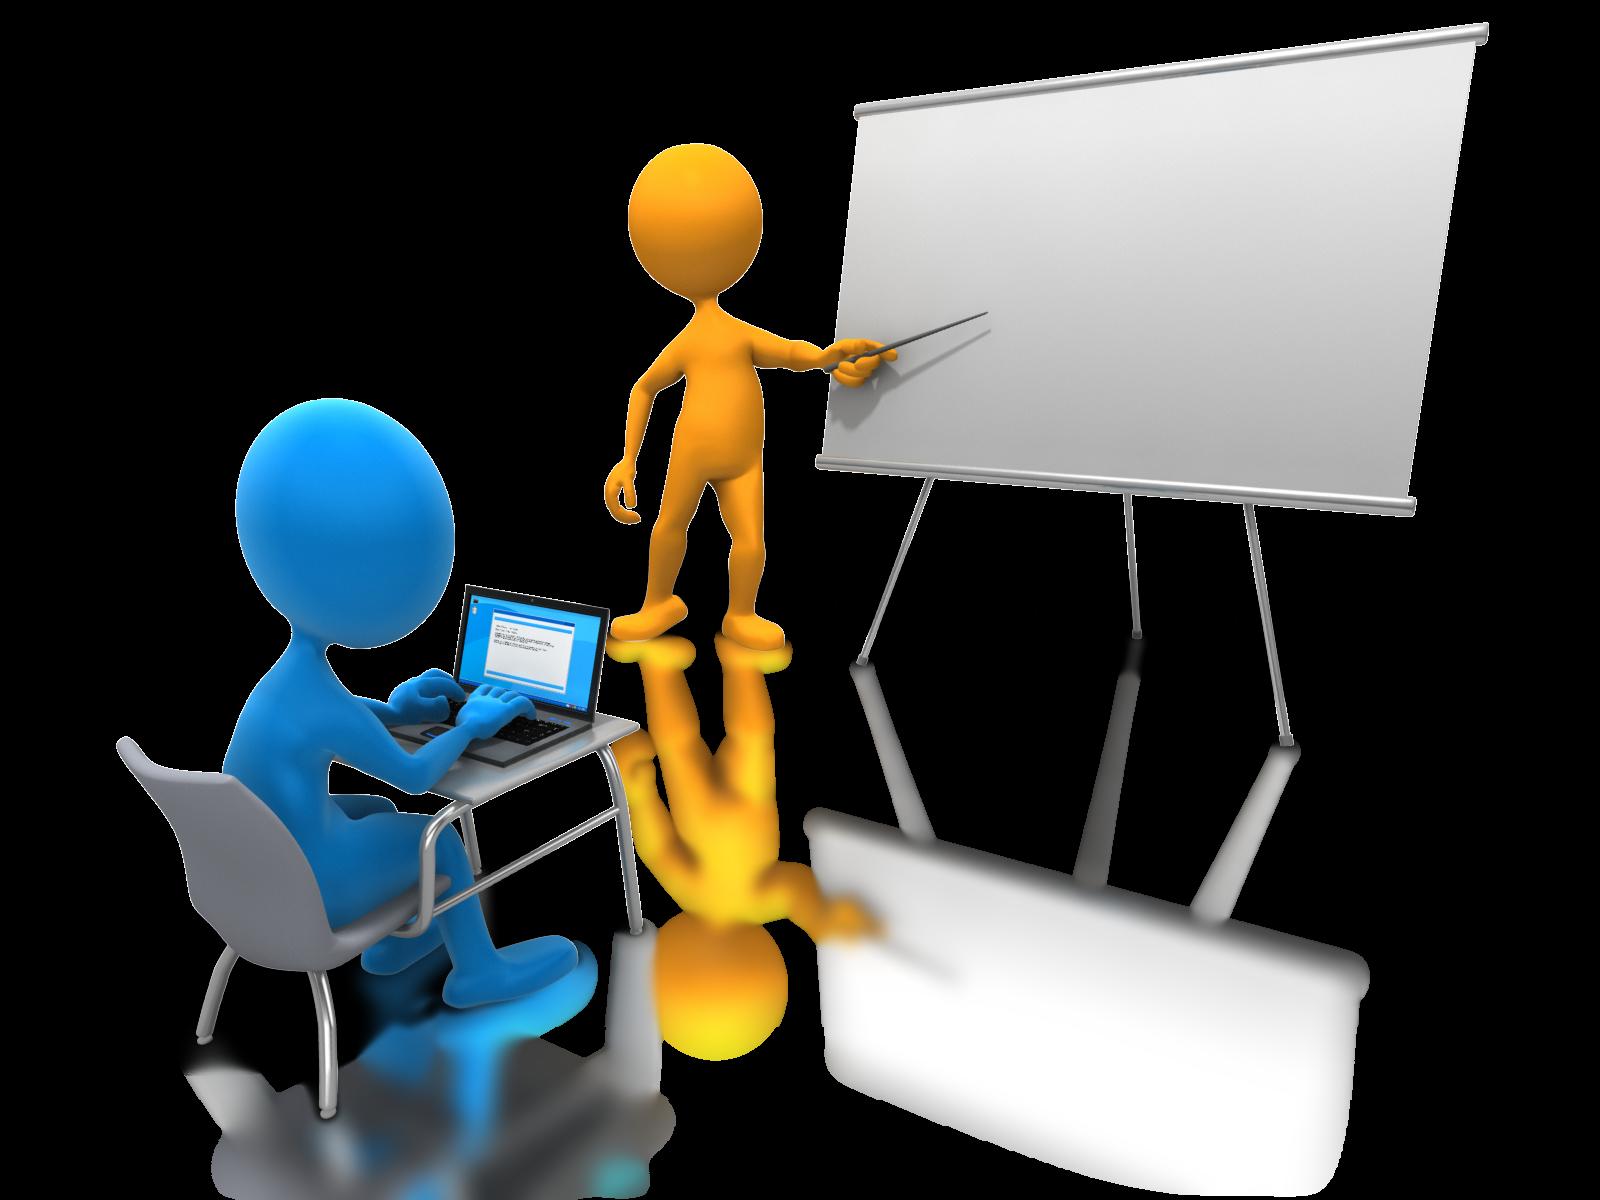 Png transparent images all. Communication clipart presentation